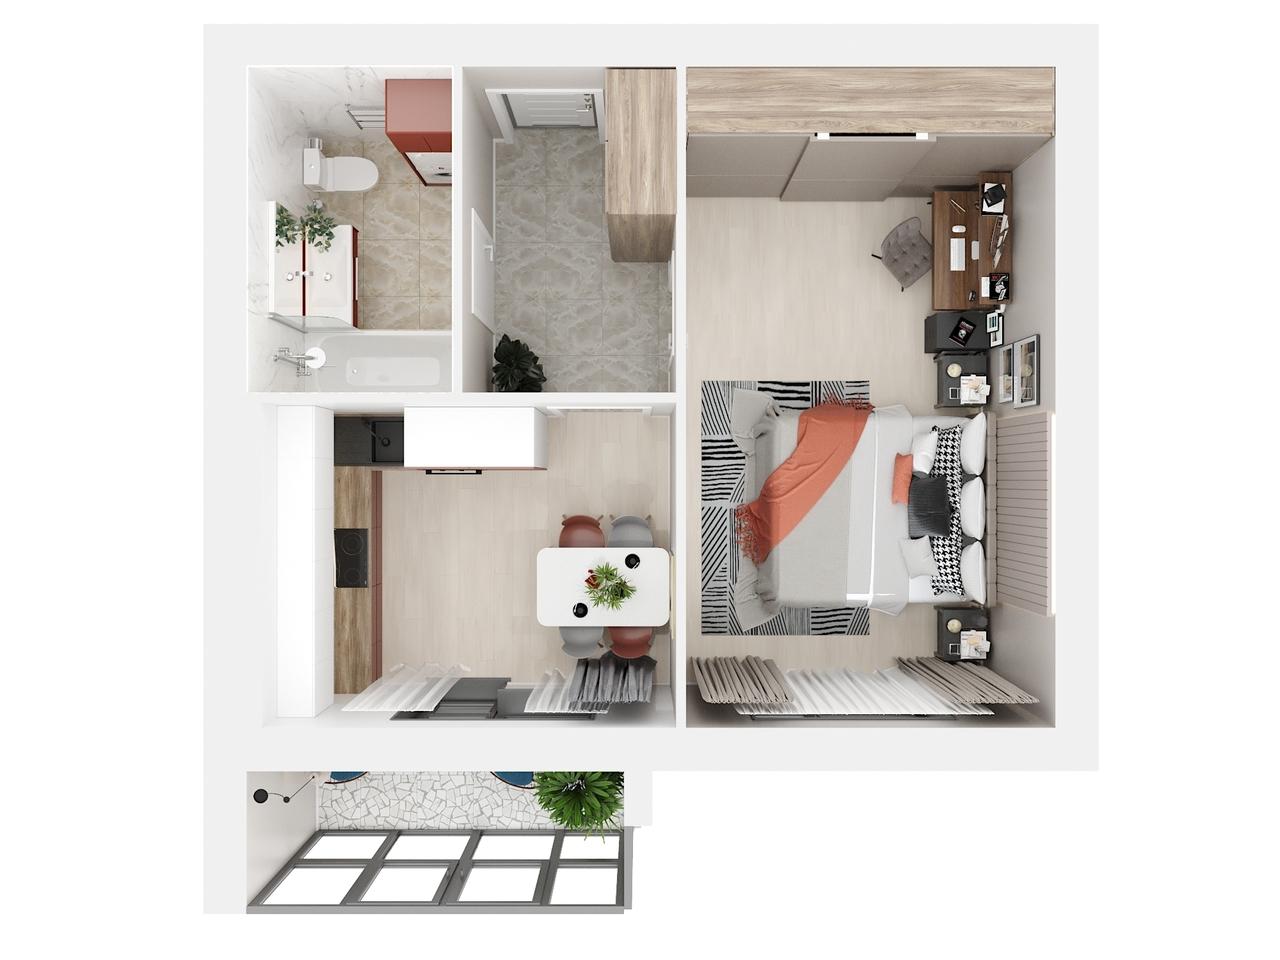 Дом 3 - 1-комнатная квартира №1